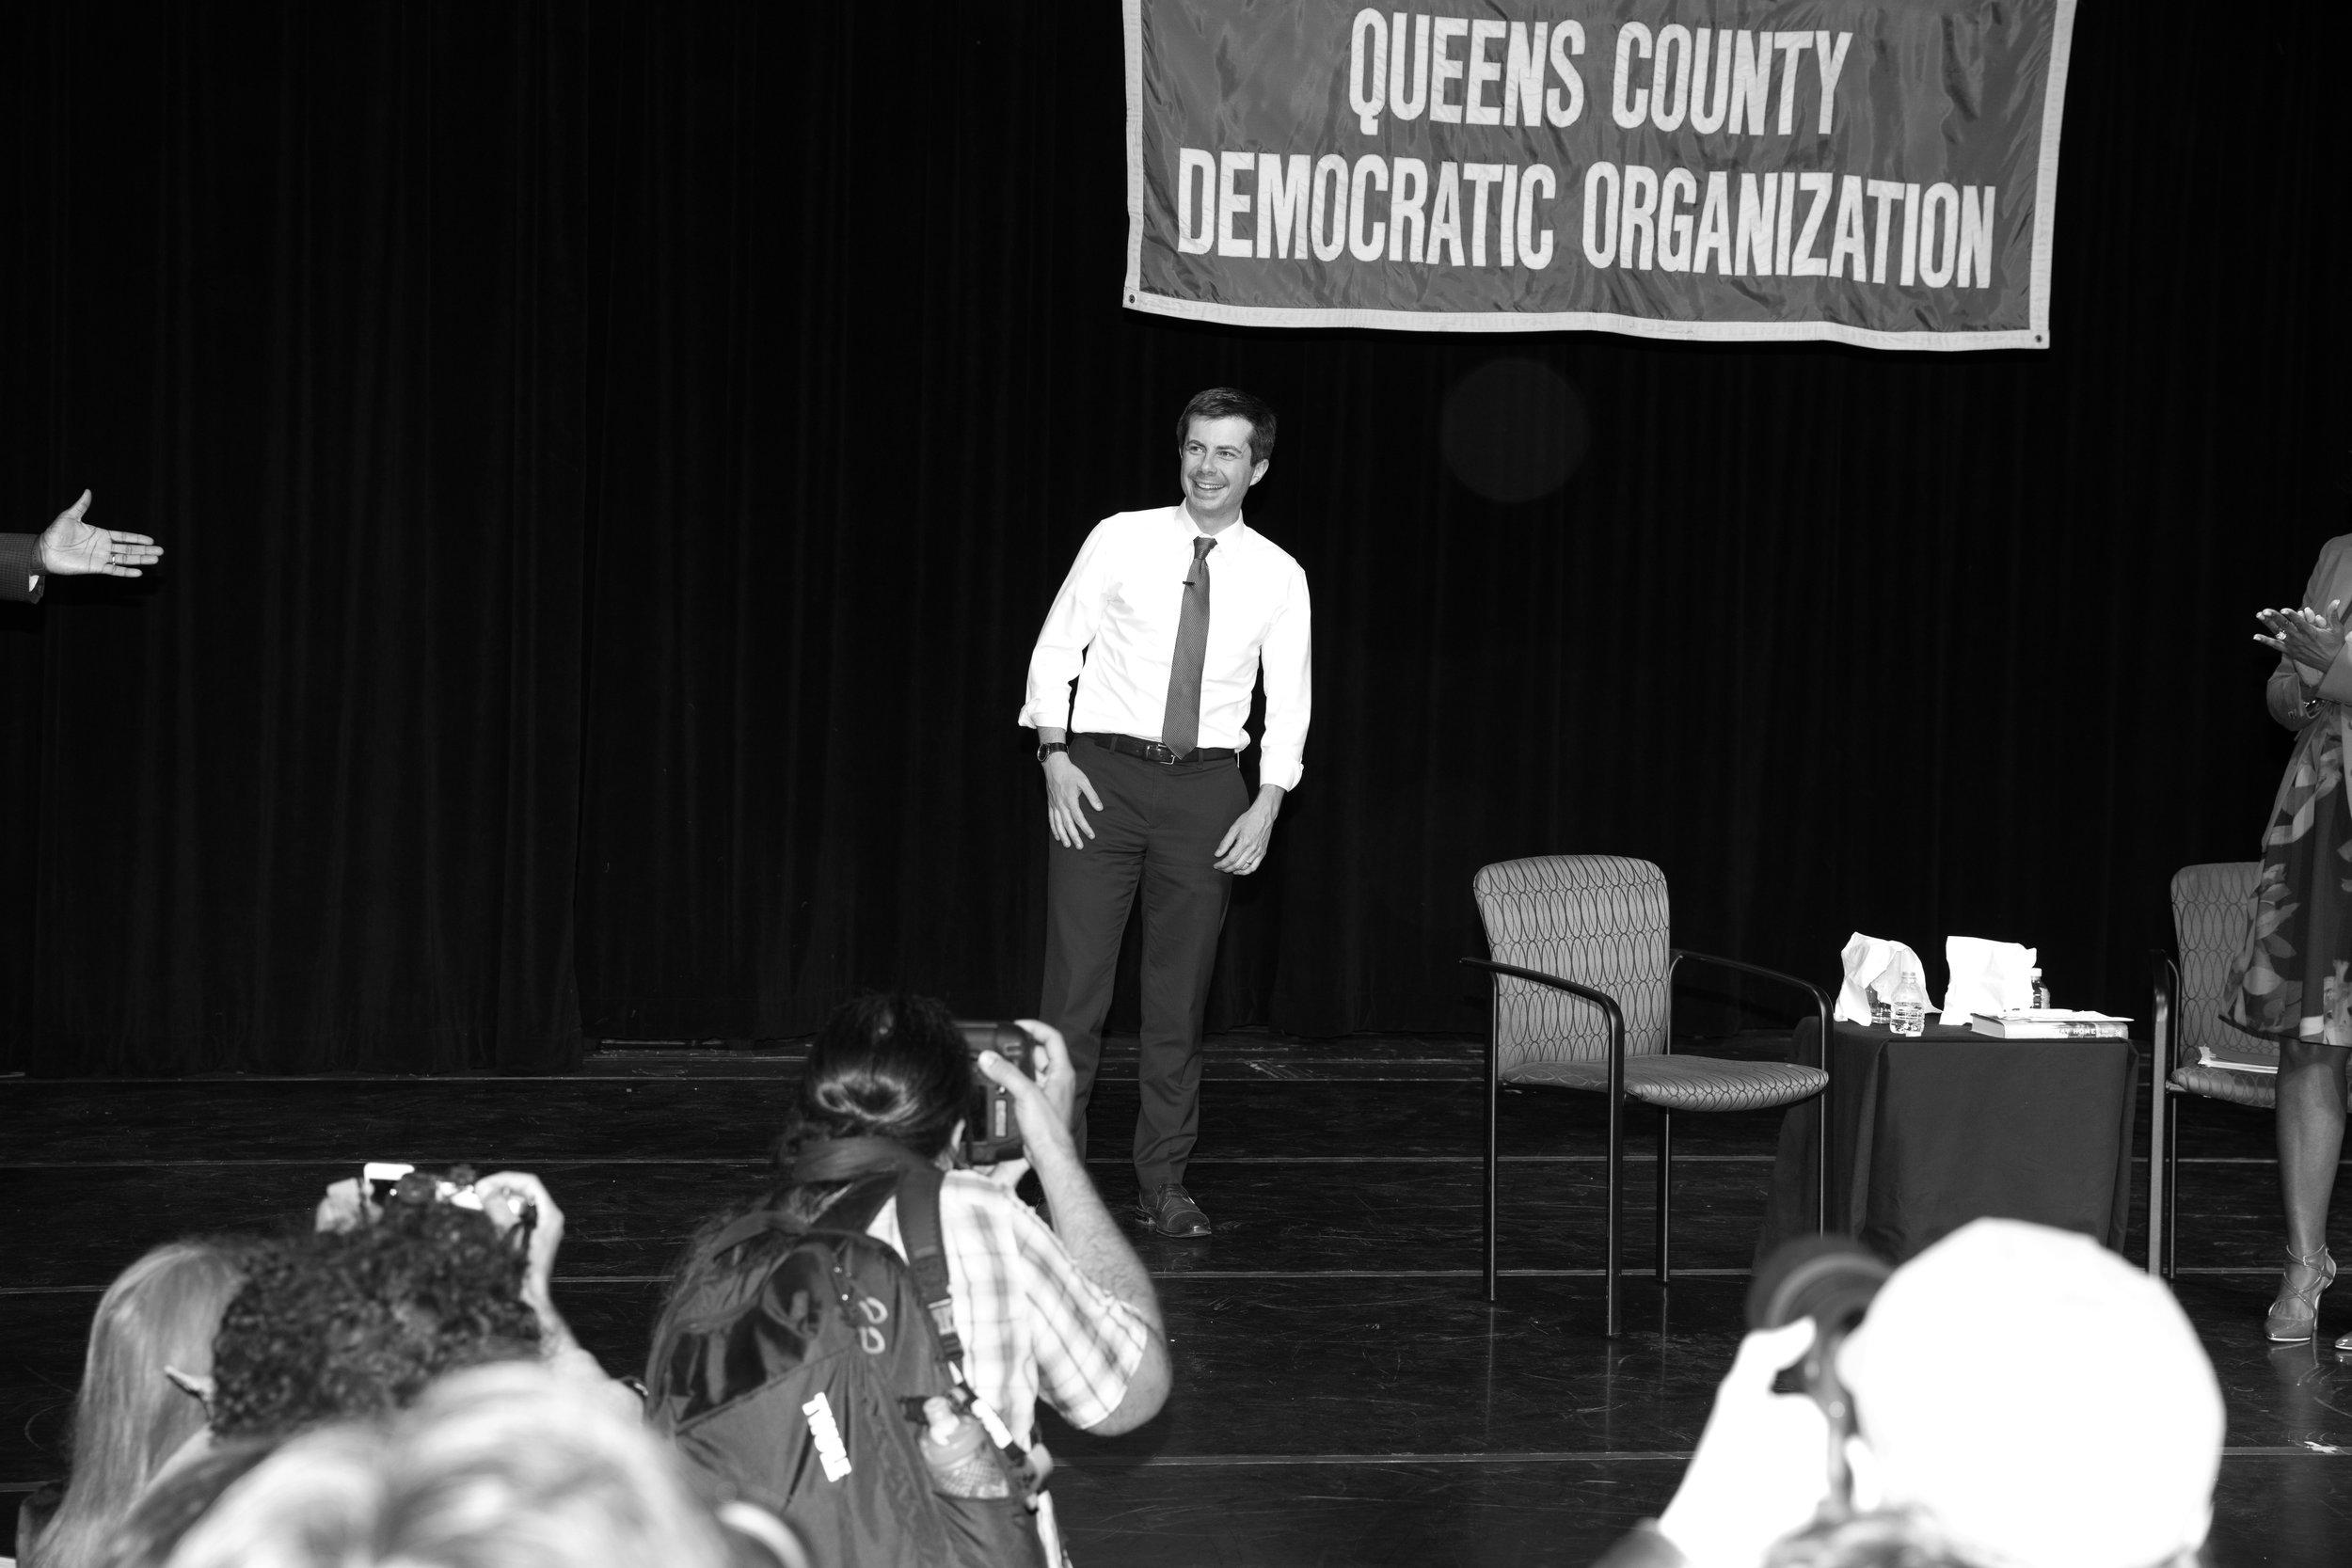 2020 Democratic Presidential Candidate Pete Buttigieg